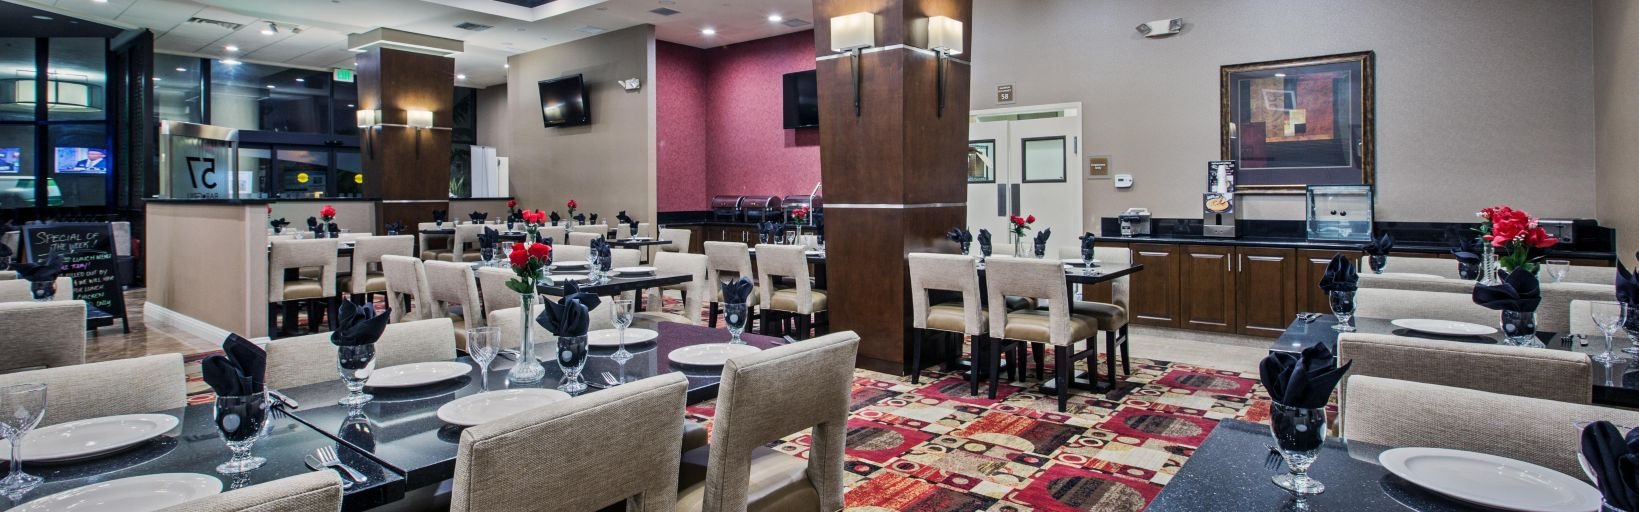 Restaurants Near Holiday Inn Hotel Suites Anaheim Fullerton